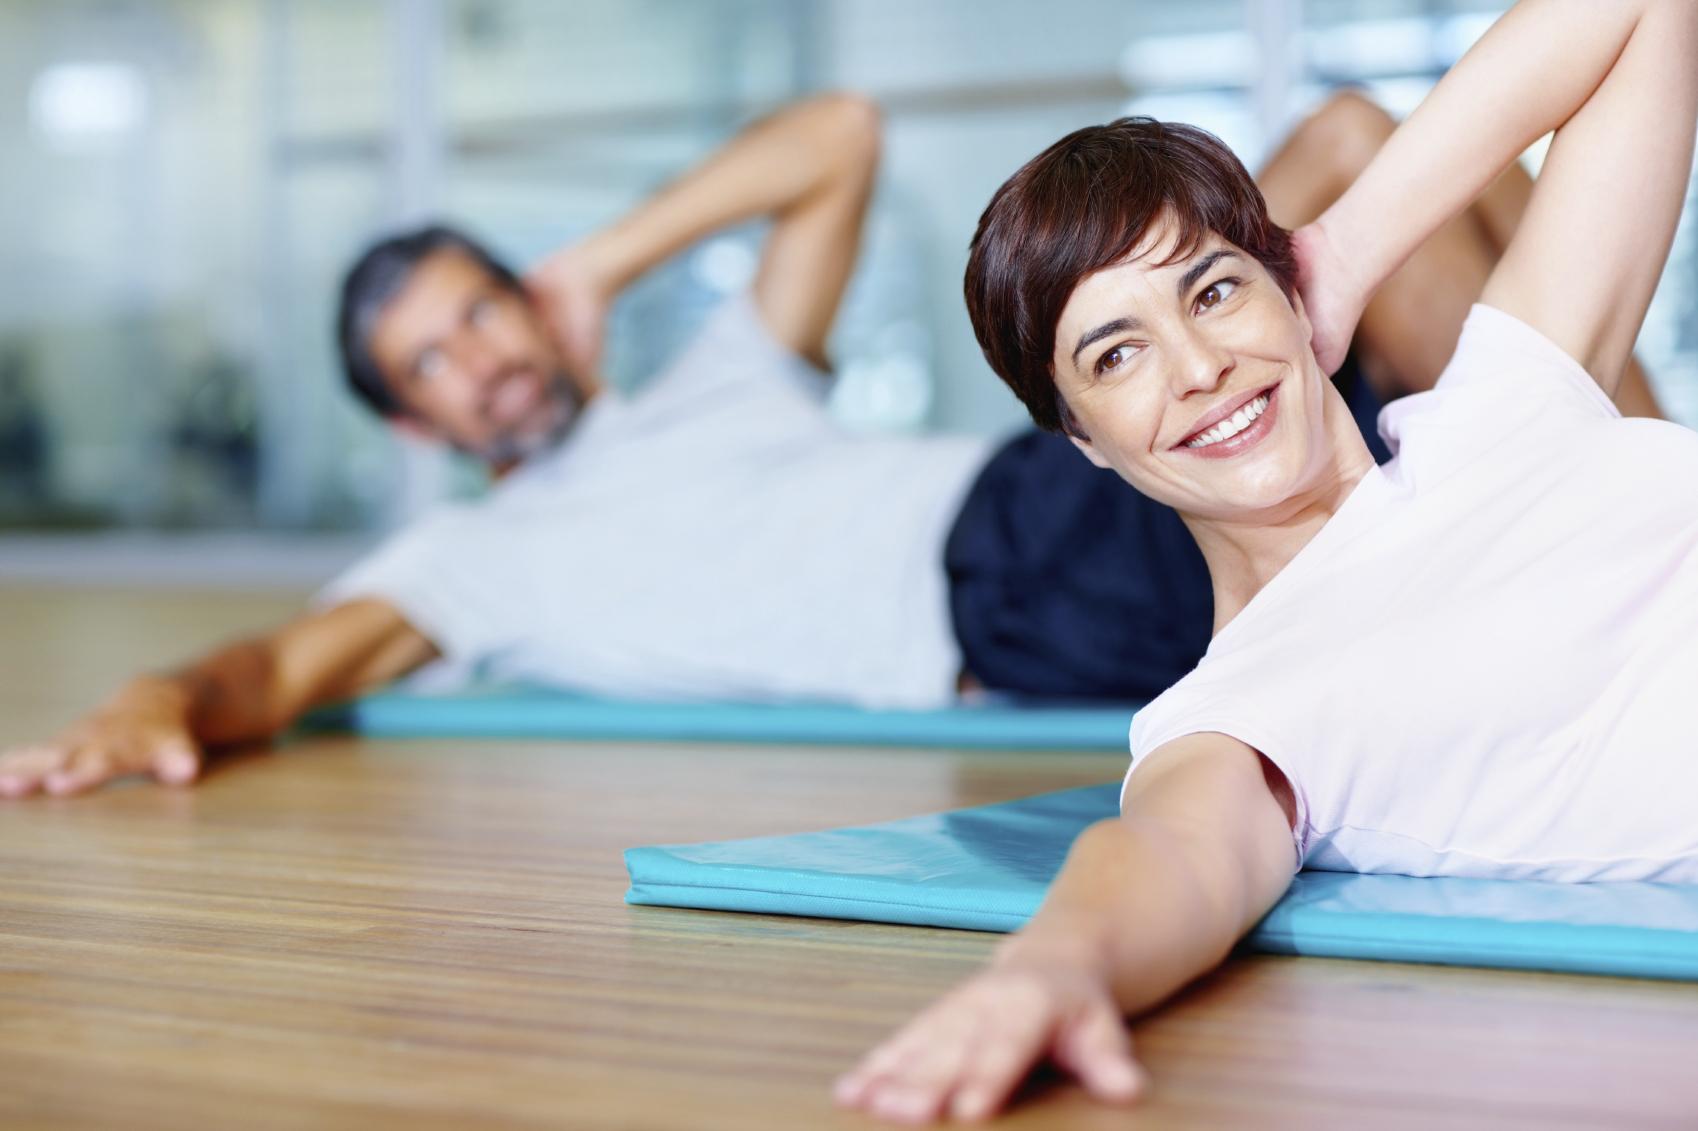 iStock_000016553198Medium-woman-exercising